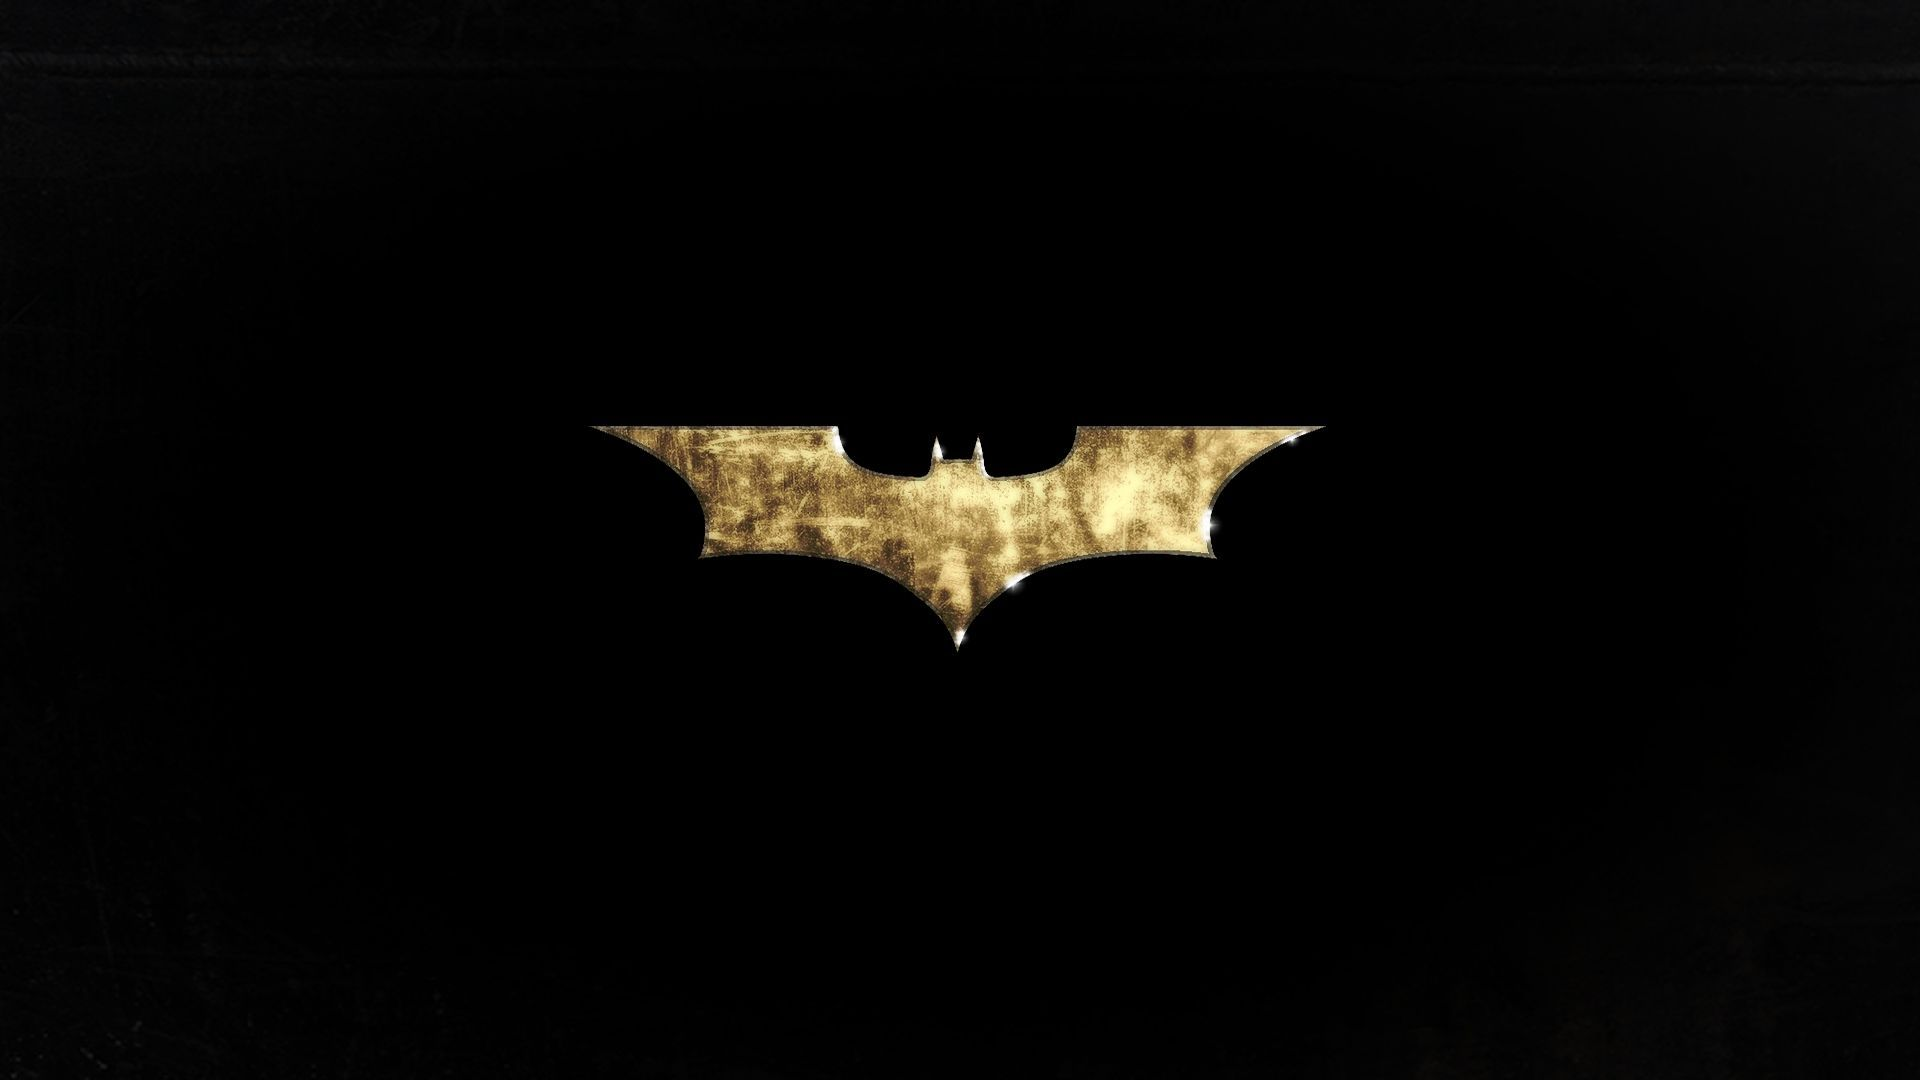 Batman wallpapers x wallpaper hd wallpapers pinterest batman batman wallpapers hd for android group batman wallpapers wallpapers voltagebd Choice Image